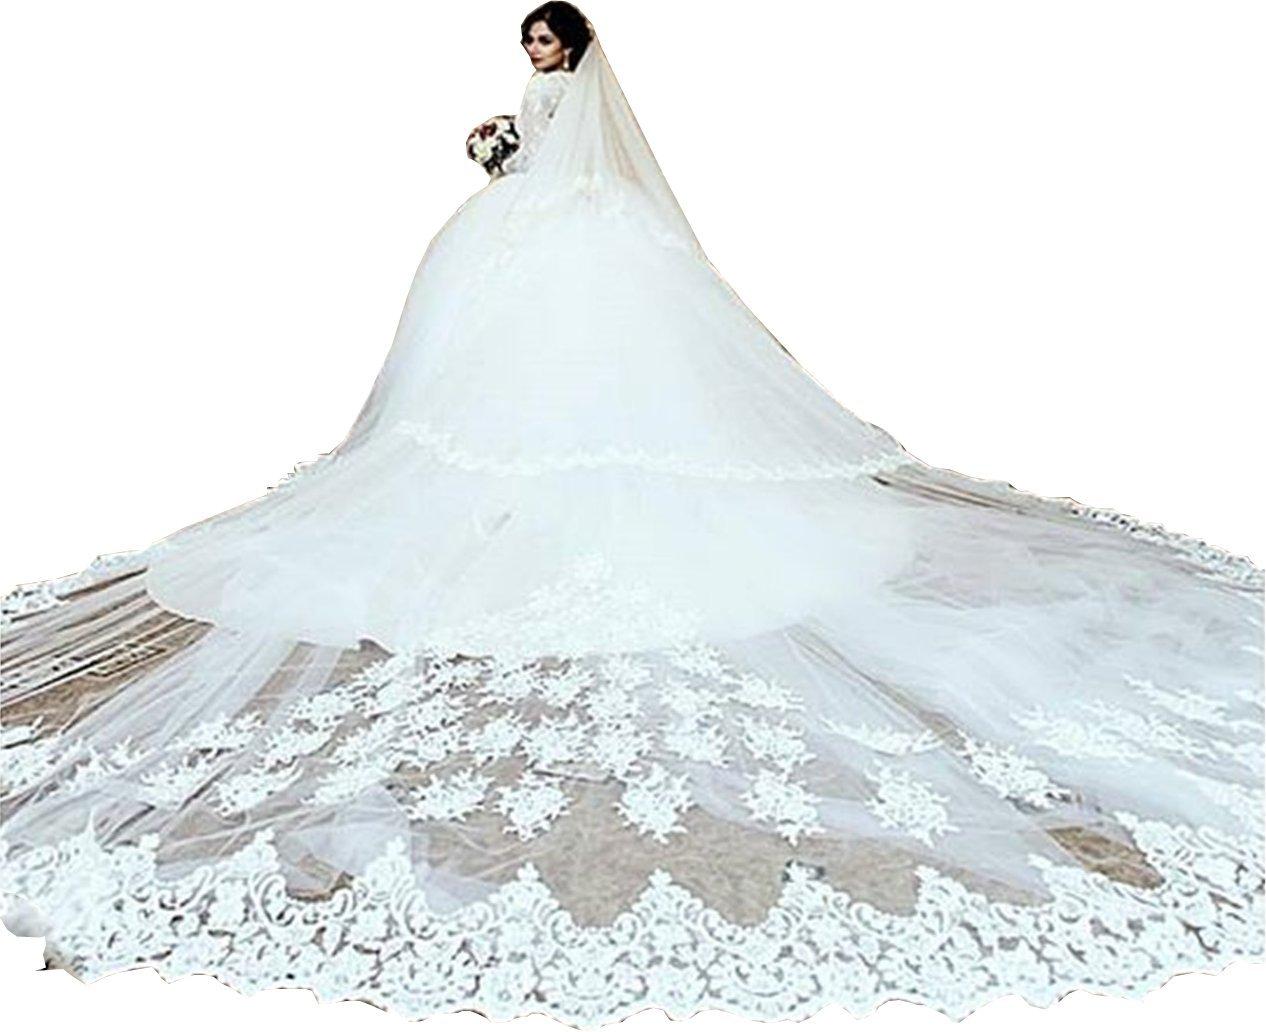 Newdeve 5M 2T Ivory White Lace Edge Cathedral Blusher Wedding Veils